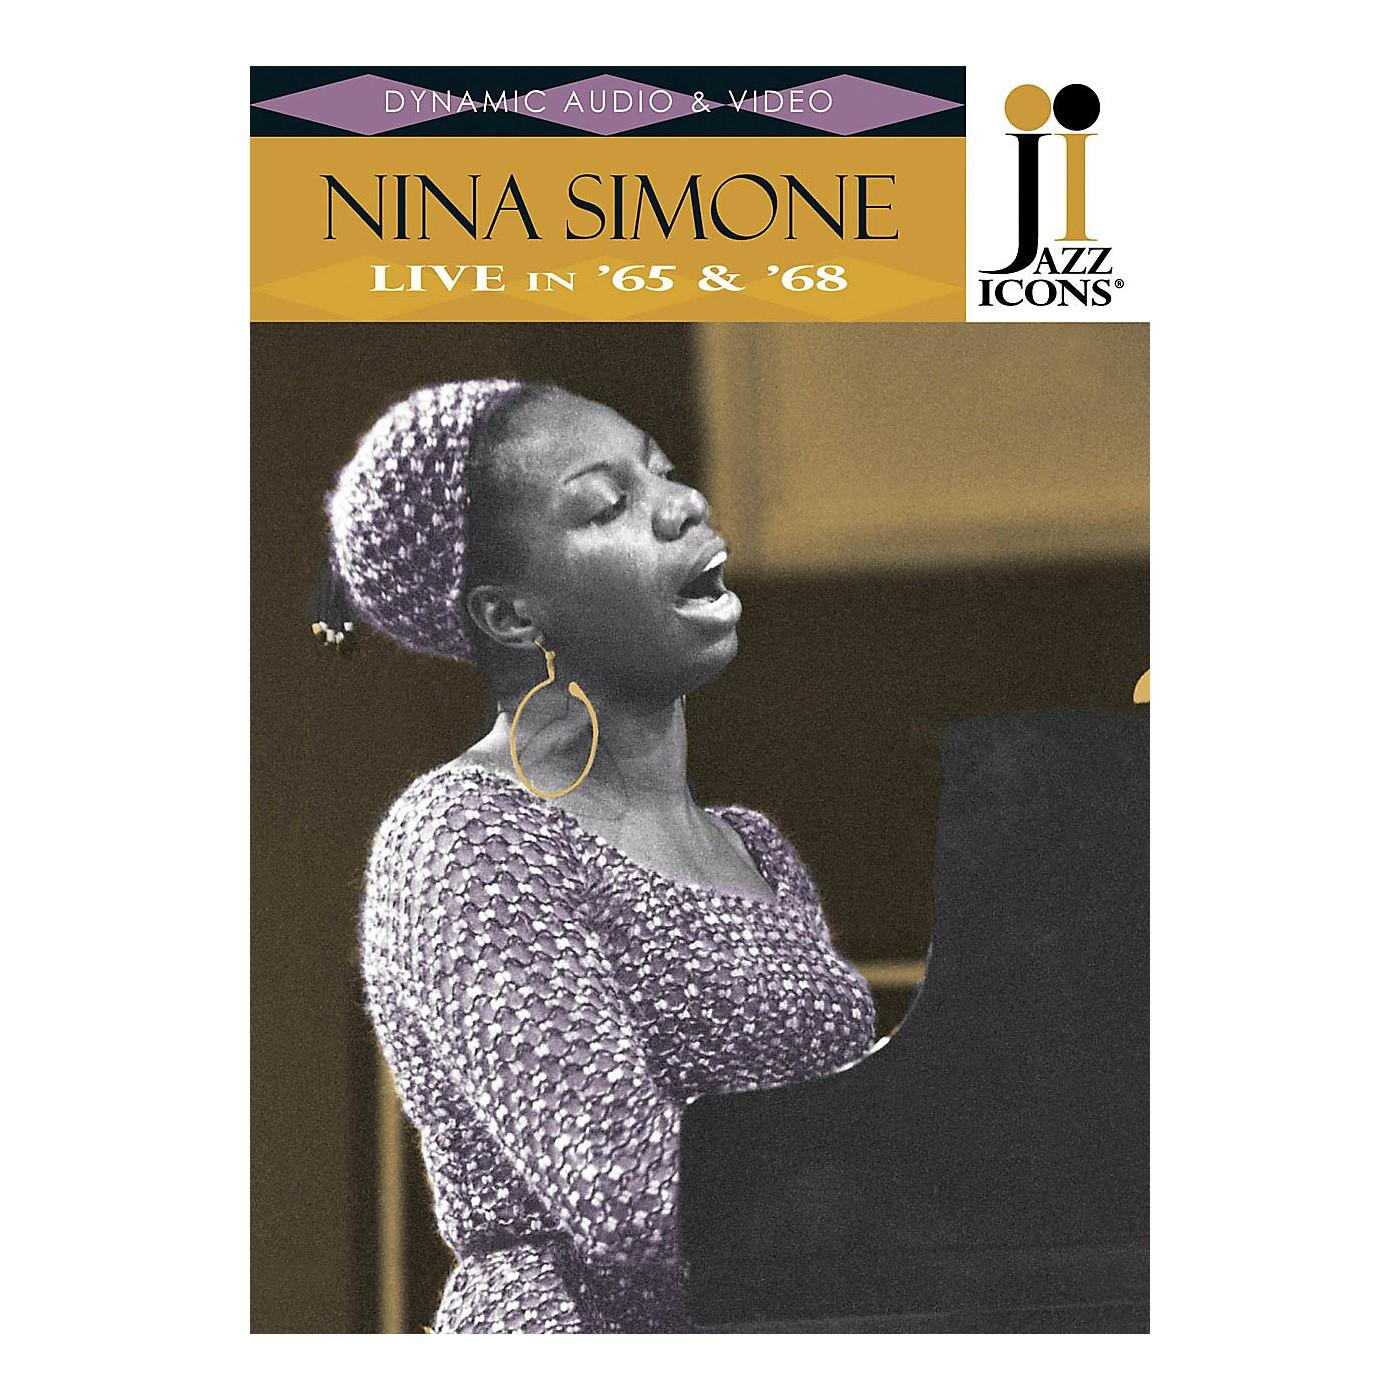 Jazz Icons Nina Simone - Live in '65 & '68 (Jazz Icons DVD) Live/DVD Series DVD Performed by Nina Simone thumbnail